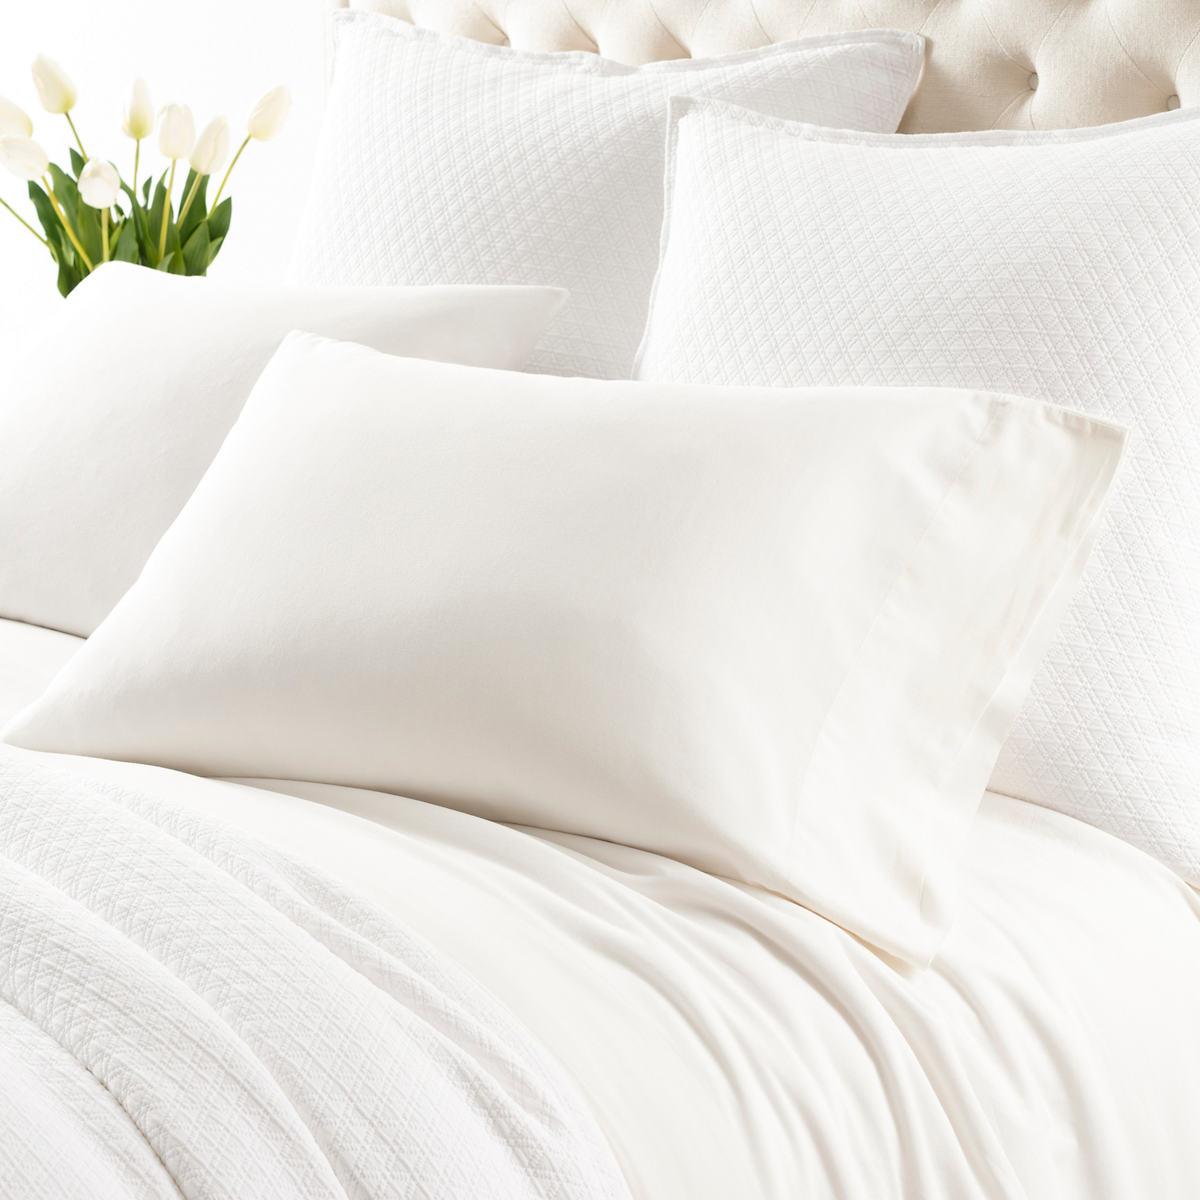 Comfy Cotton Dove White Pillowcases